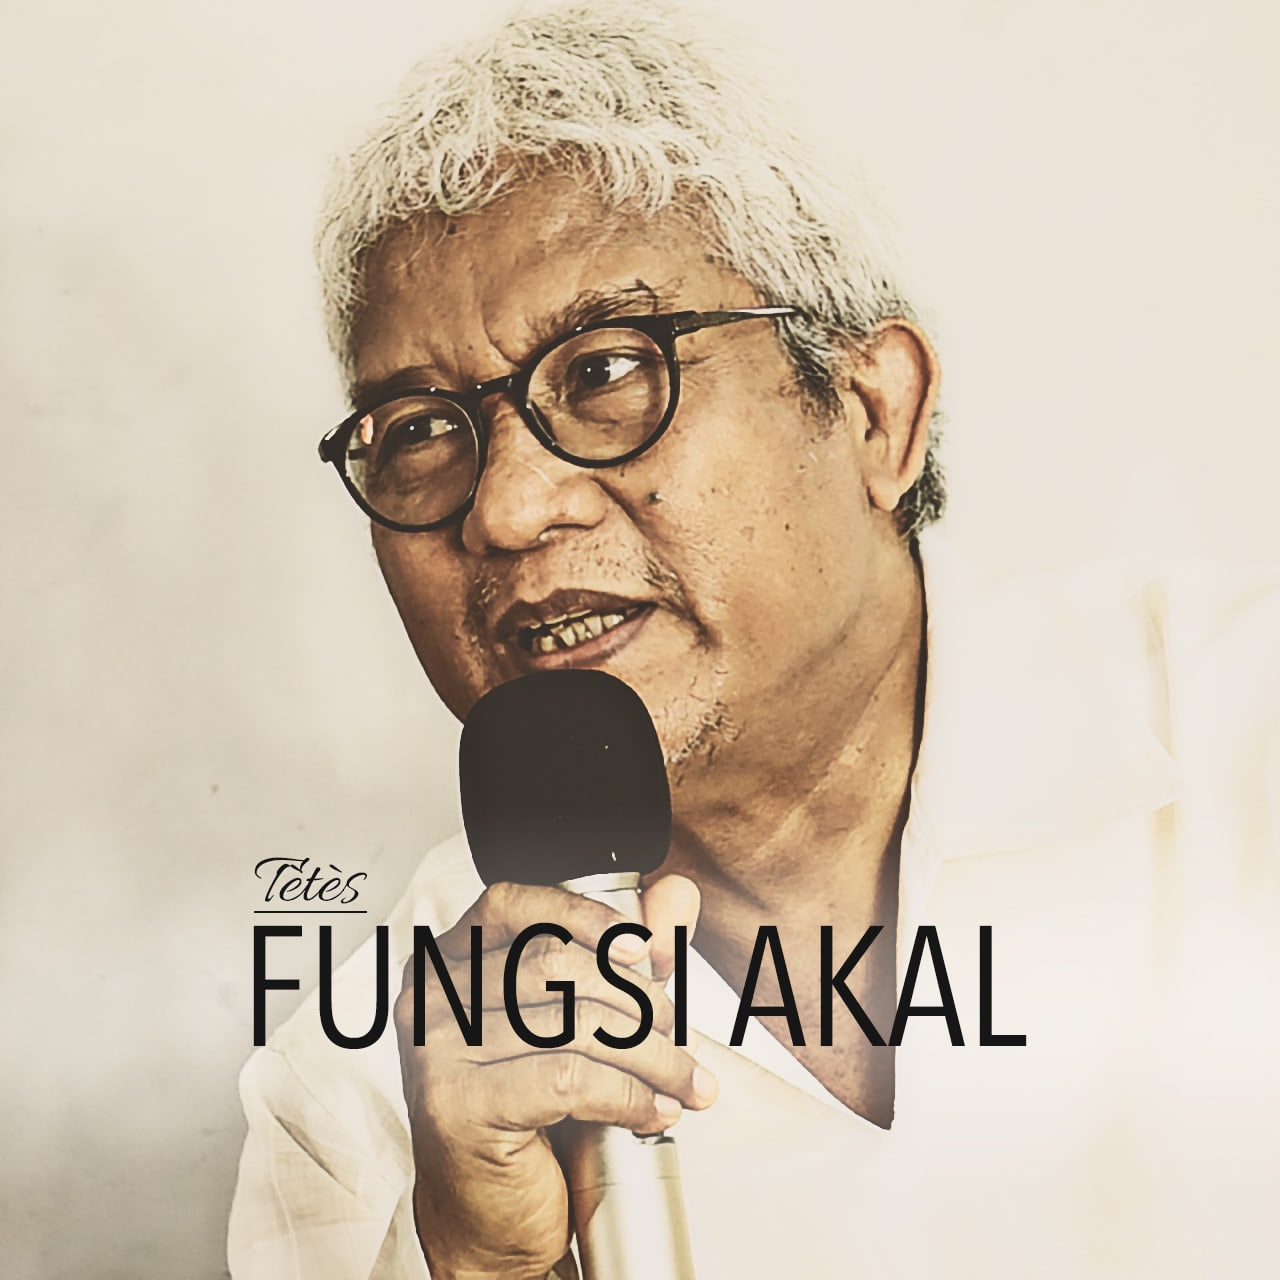 Fungsi Akal